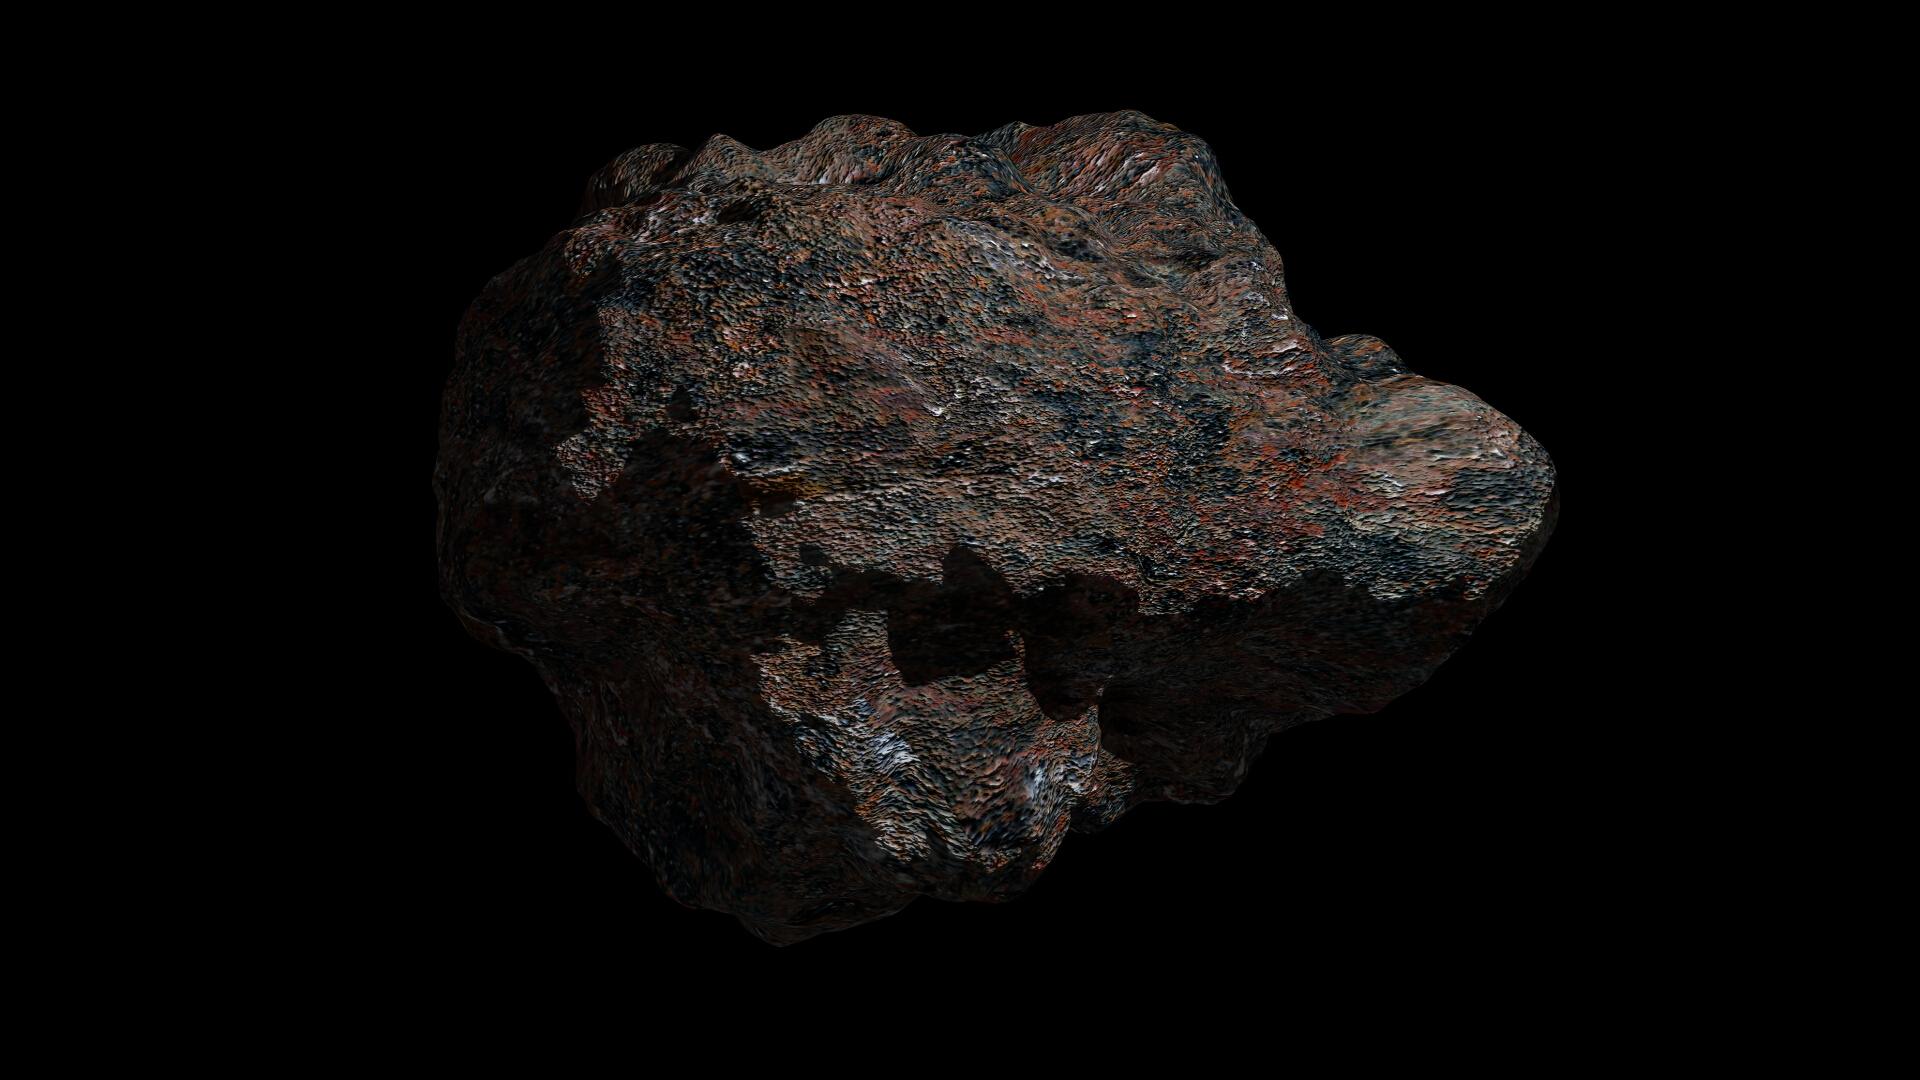 fantasy asteroid 3 3d model 3ds fbx dae obj 267325